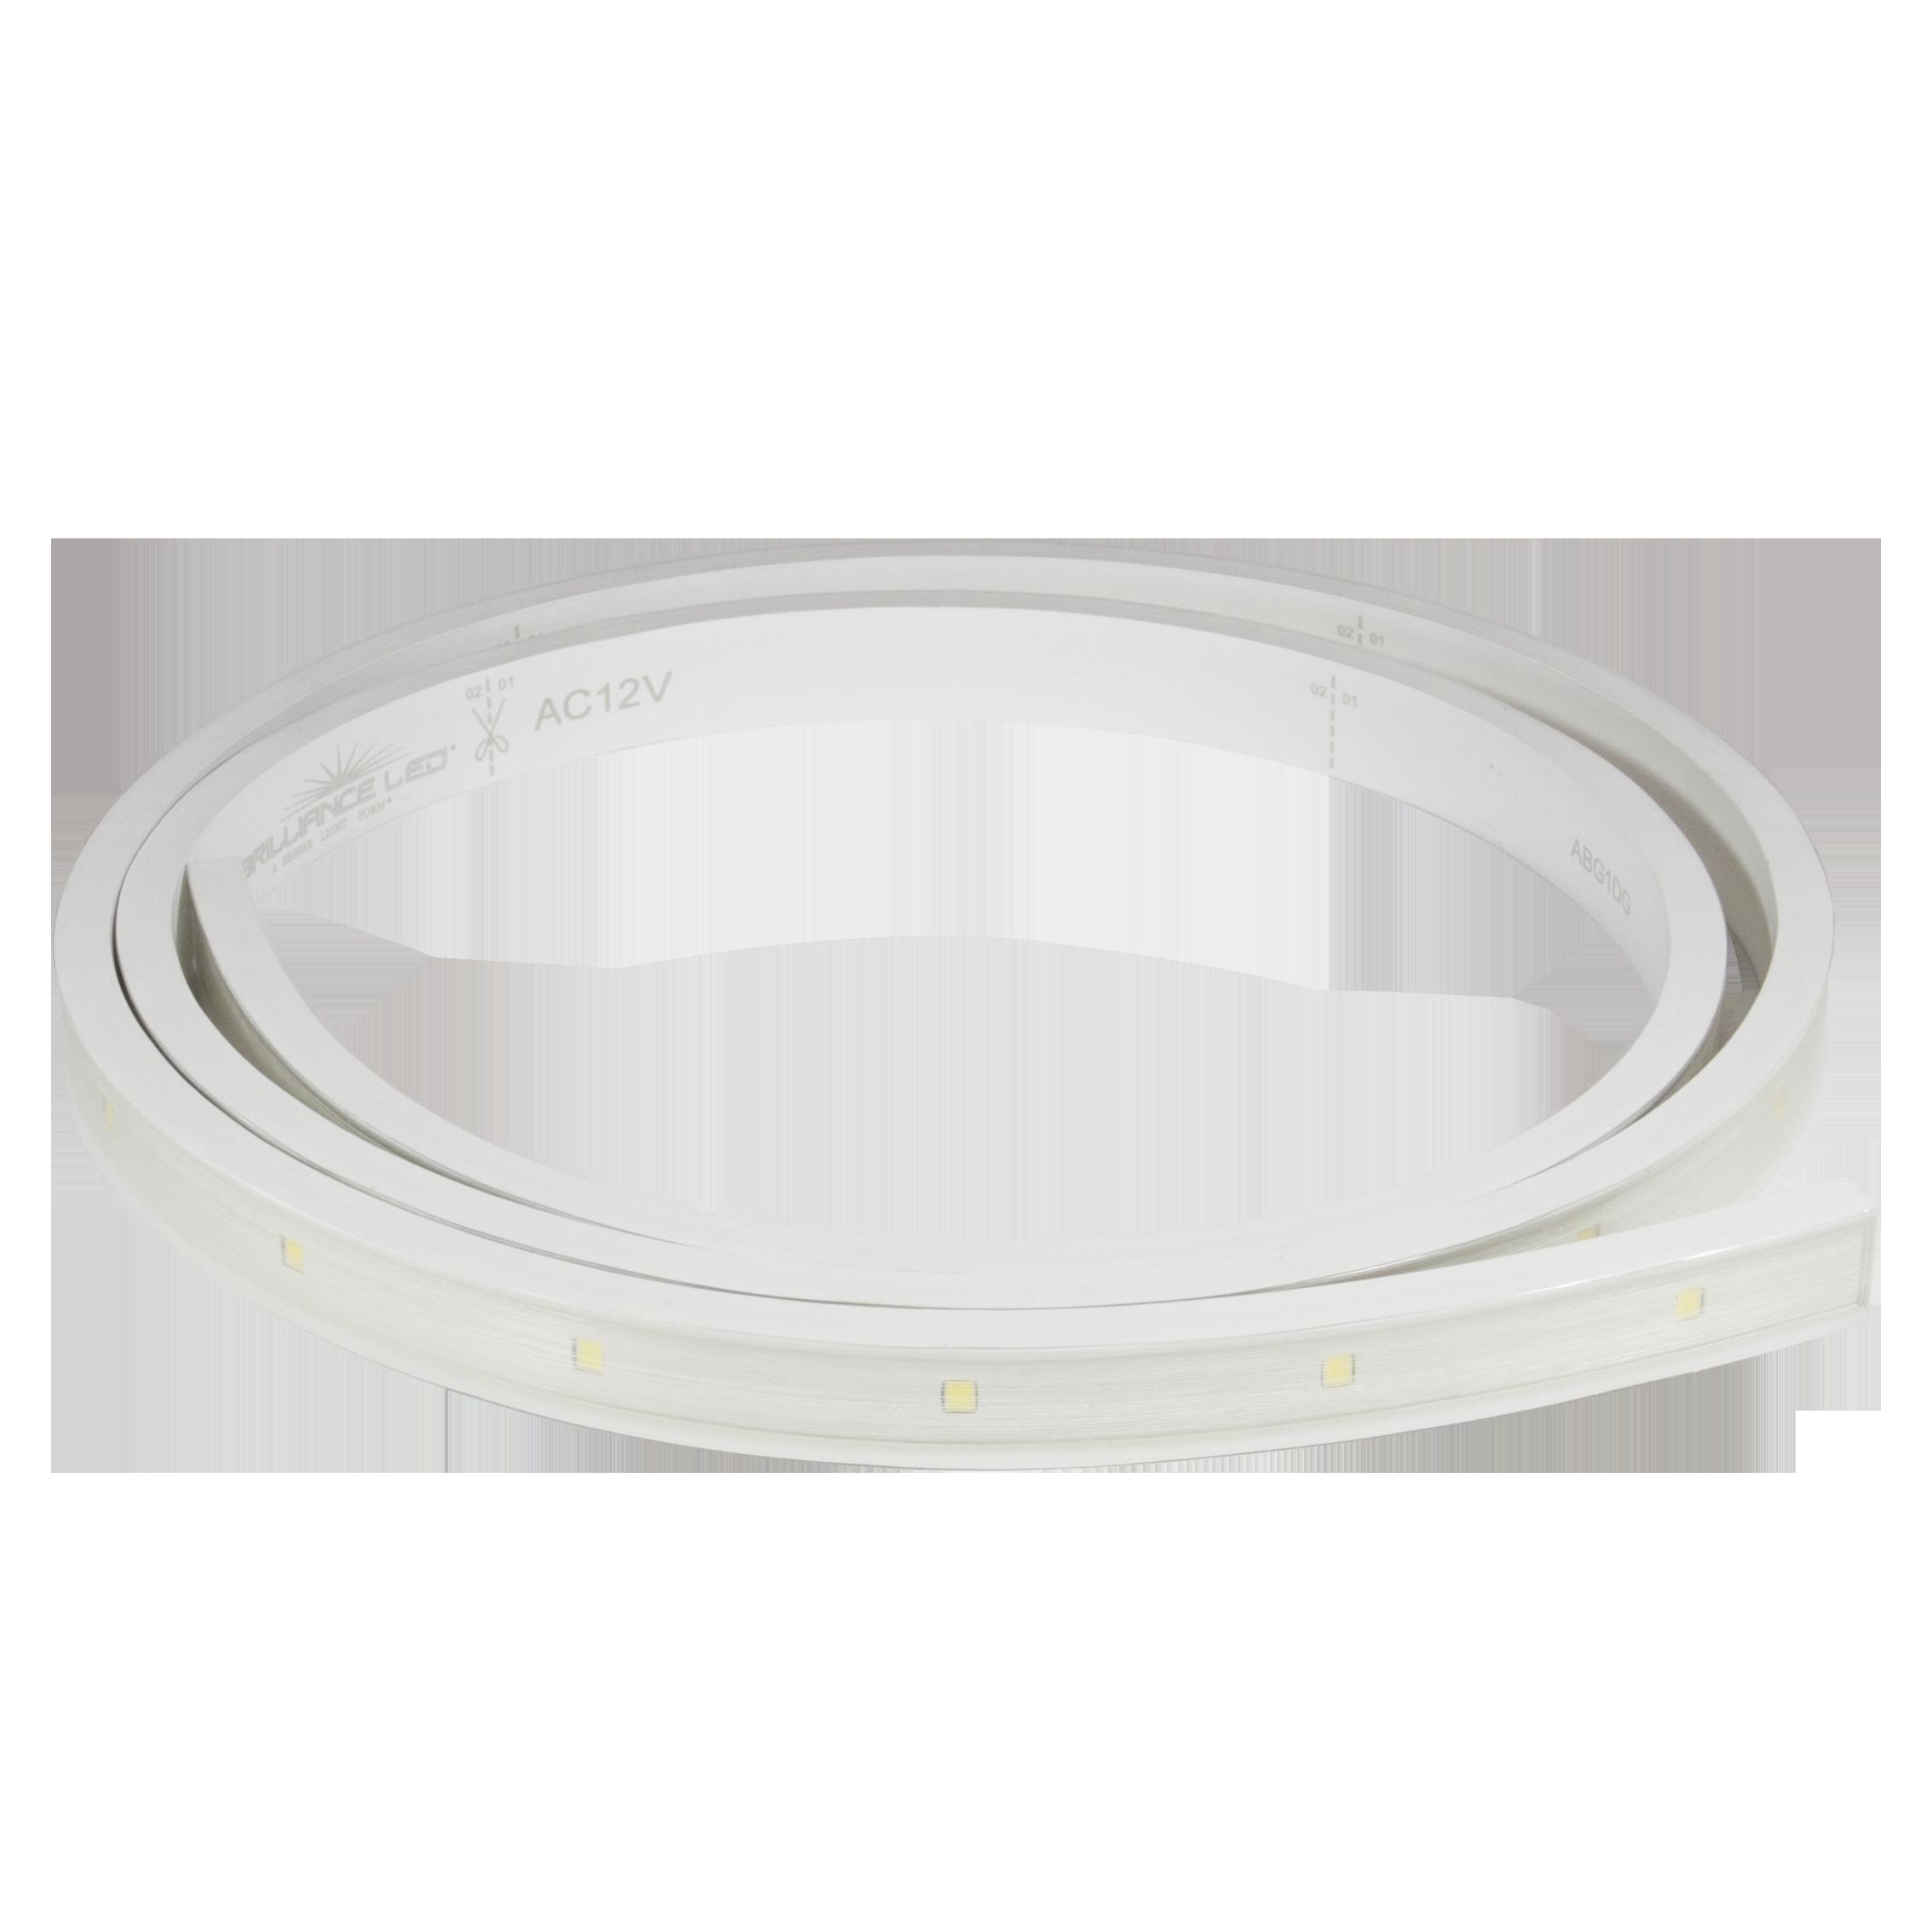 Strip Light  Wattage: 1.8 Lumens: 45 per ft.